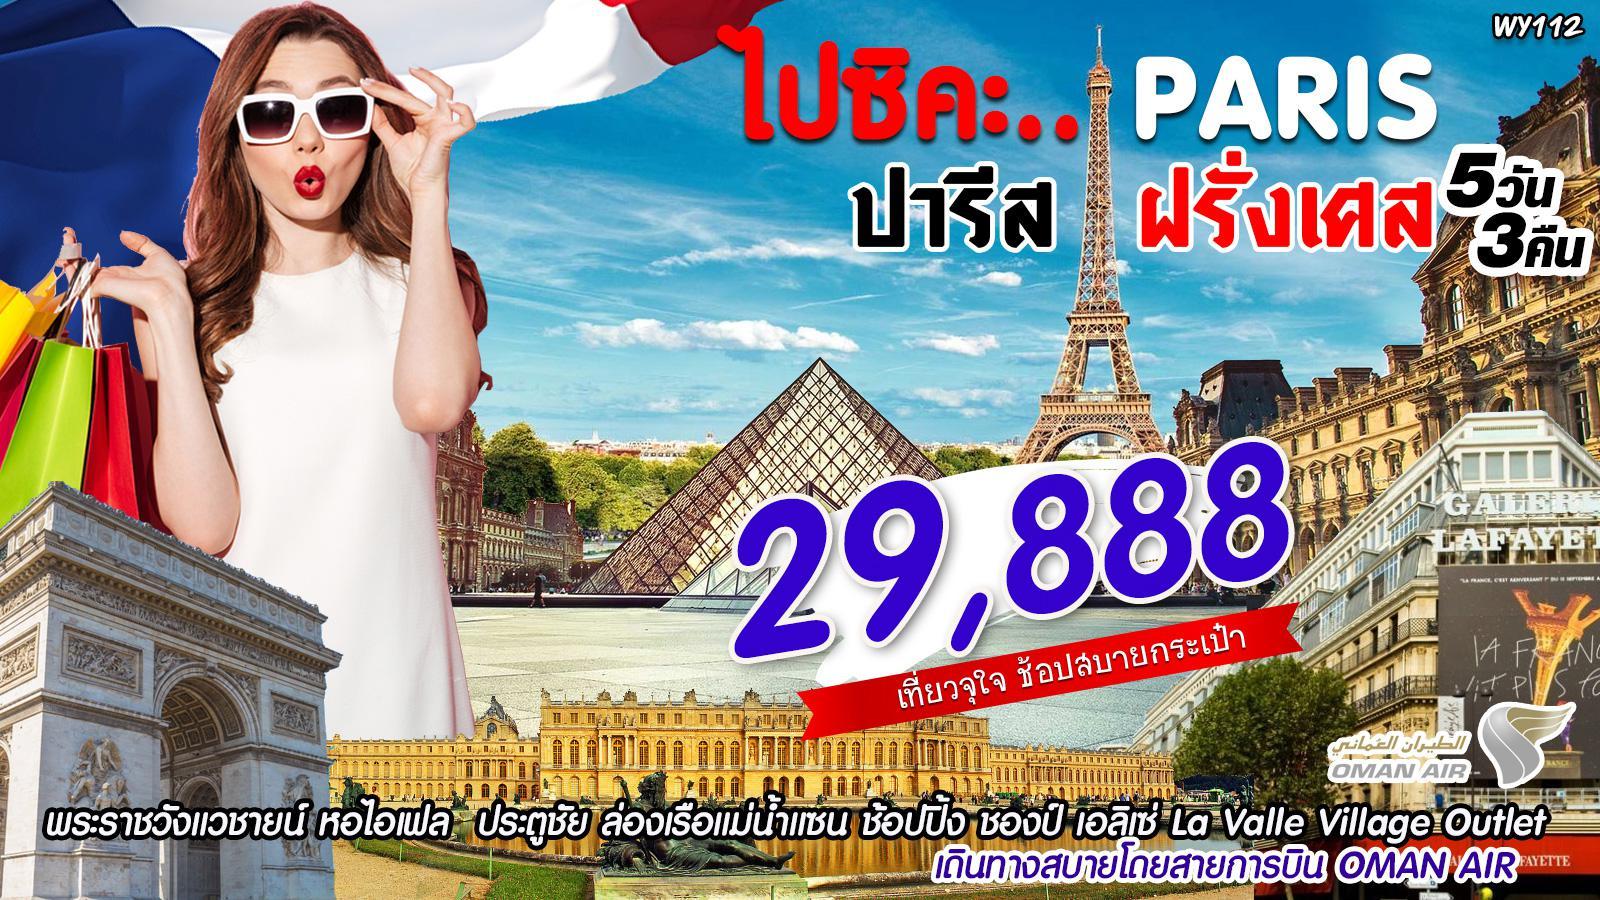 WY112 ไปซิคะ PARIS FRANCE 5D3N